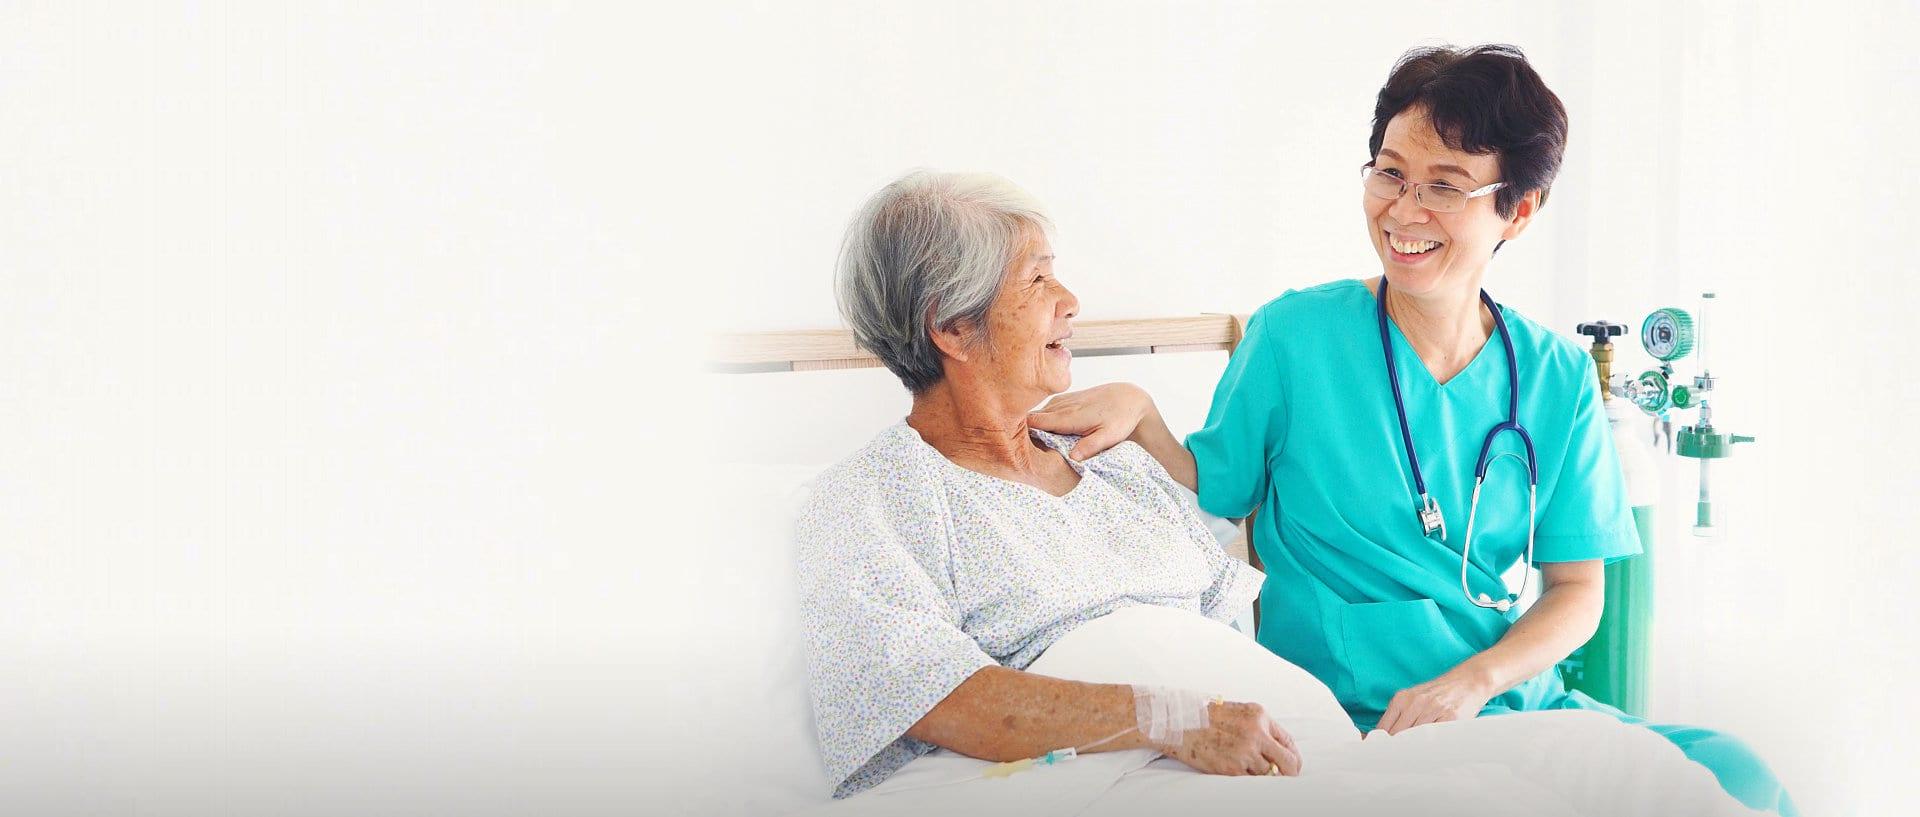 nurse and senior patient talking